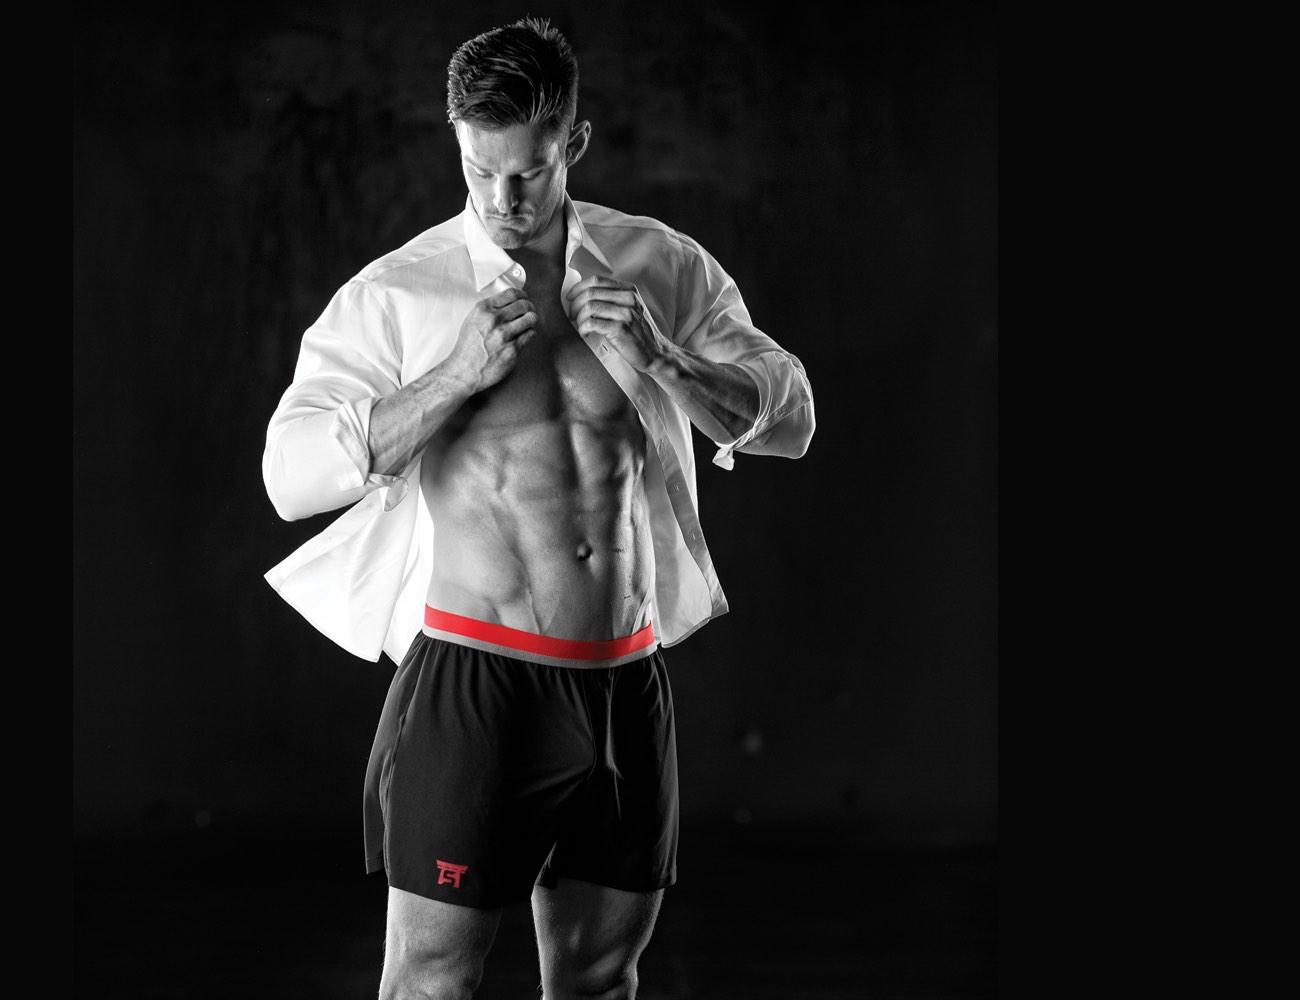 The+Ultimate+Underwear+%26%238211%3B+Comfort%2C+Style+%26amp%3B+Performance